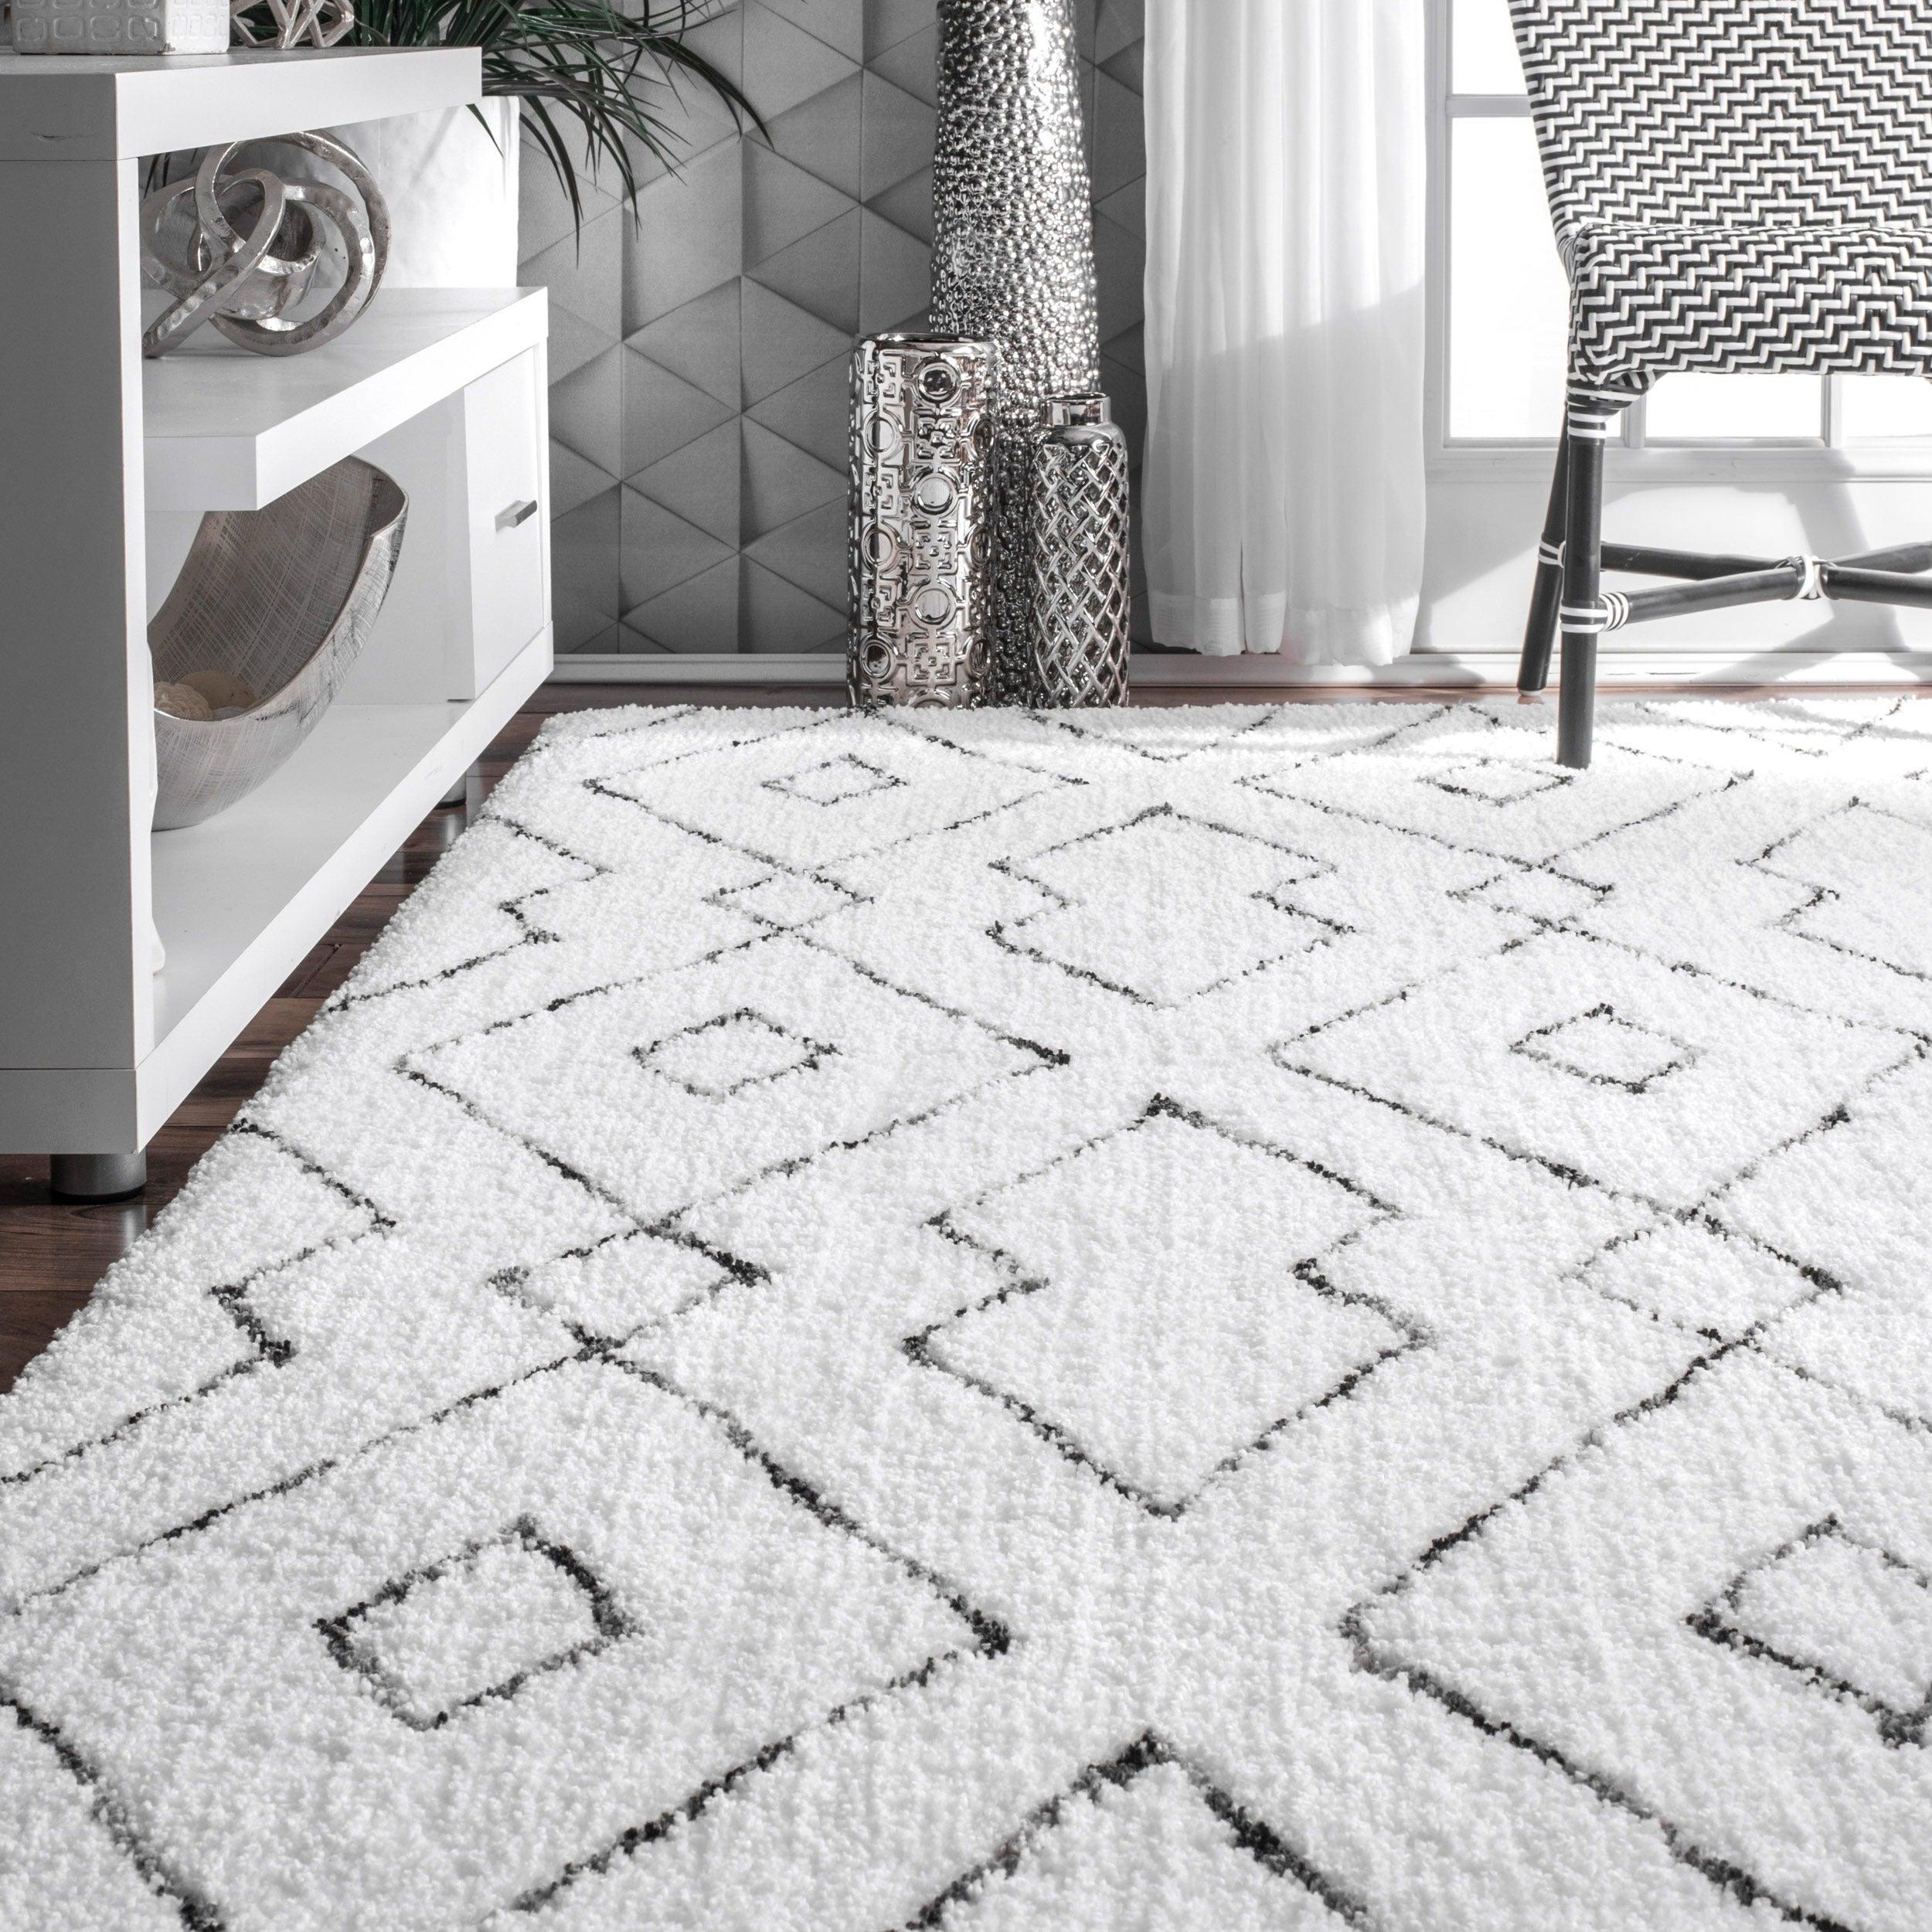 nuloom handmade plush white grey diamond lattice shag rug 76 x 96 free shipping today overstockcom 17681837 - Black And White Rug